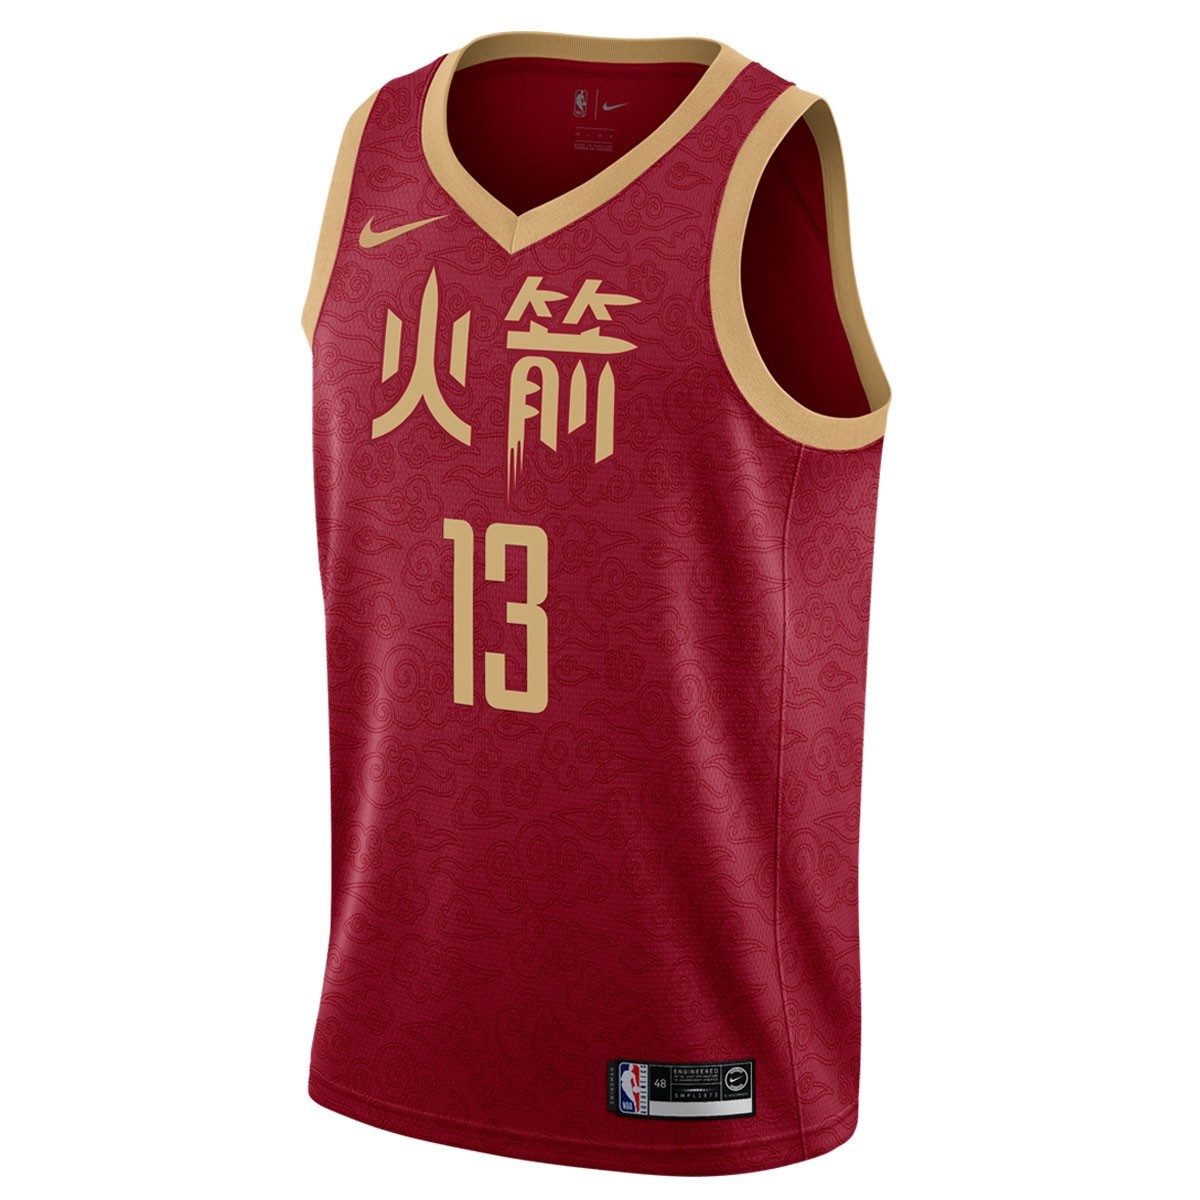 Nike NBA Houston Rockets Swingman Jersey Harden 'City Edition'